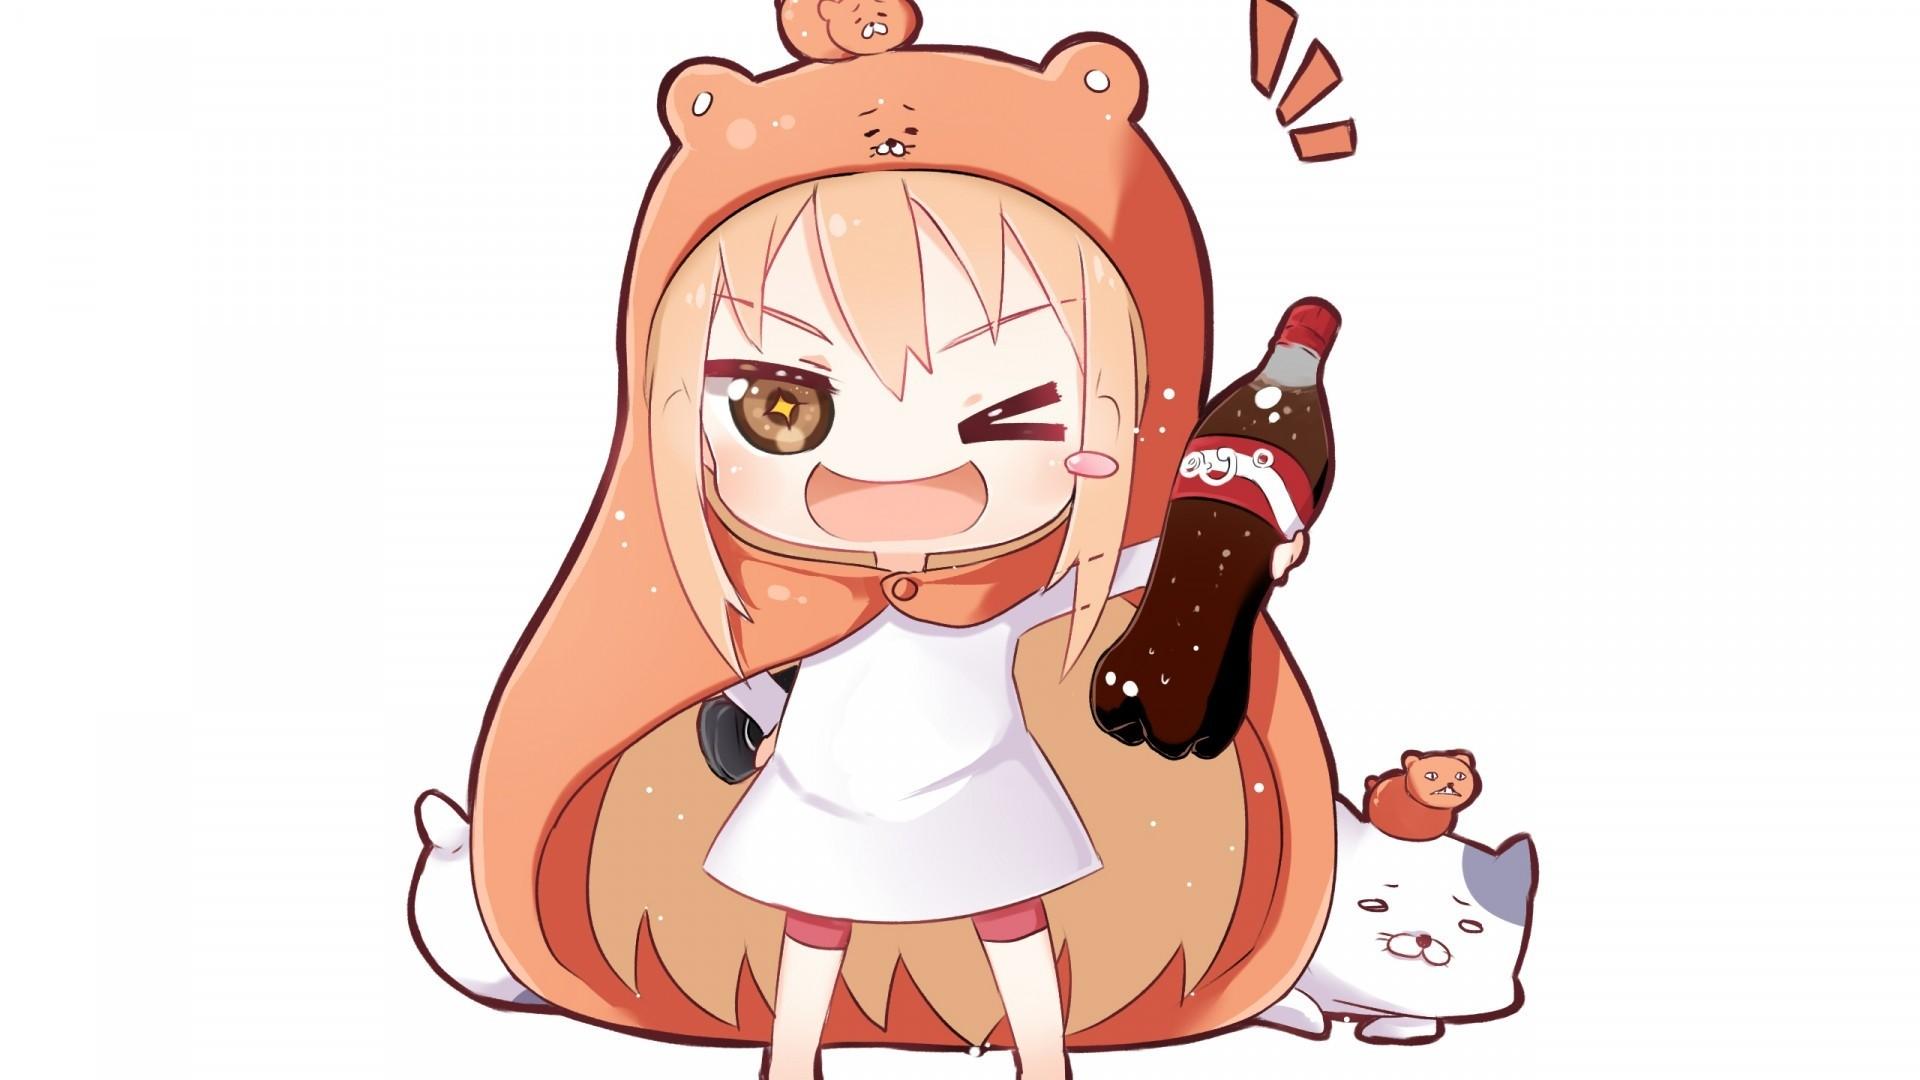 Chibi Anime Girl wallpaper photo hd